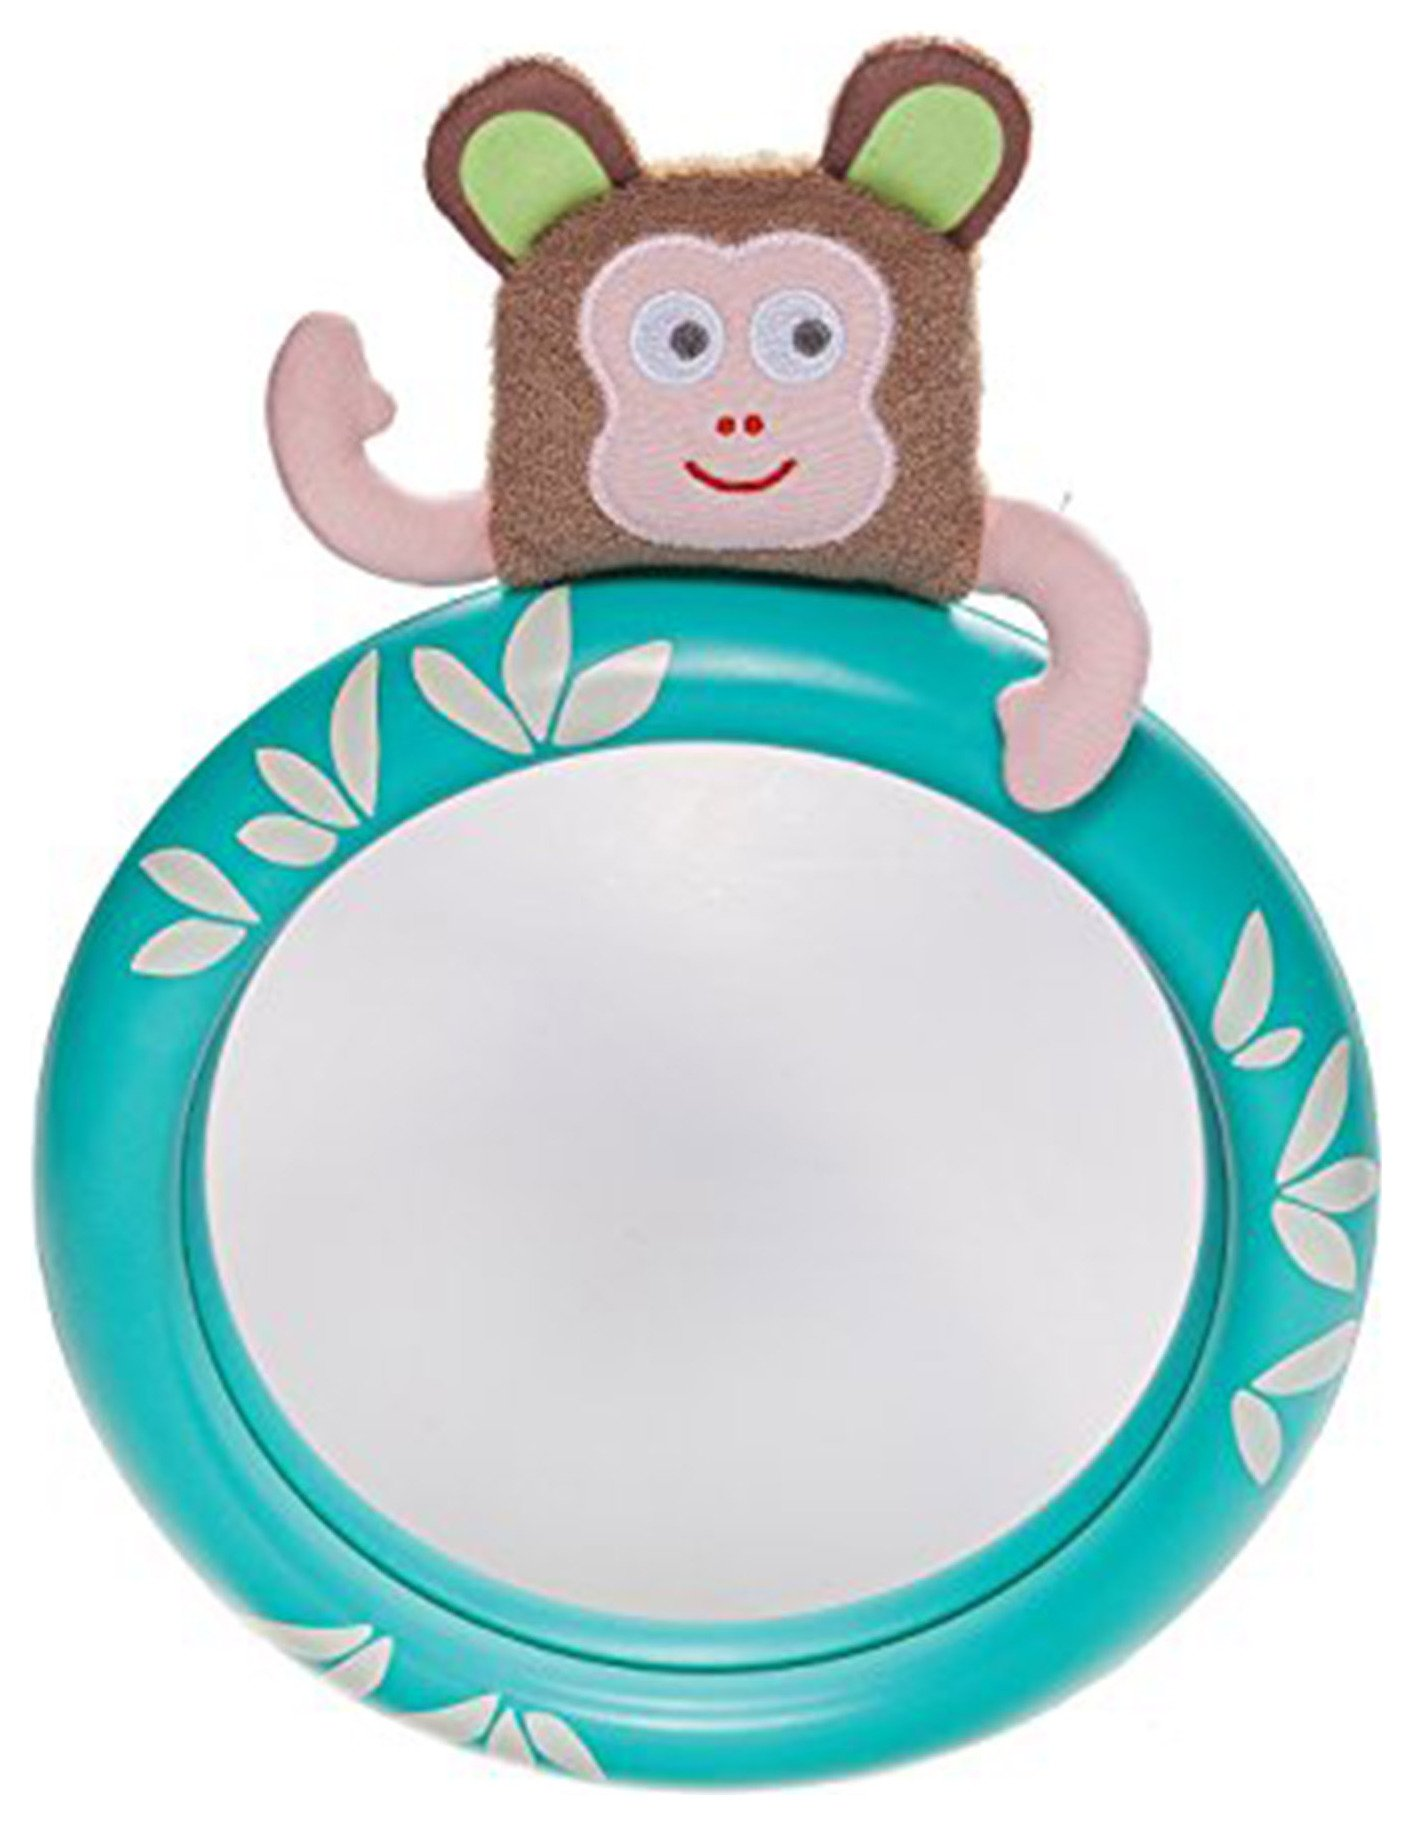 Image of Taf Toys Tropical Car Mirror.